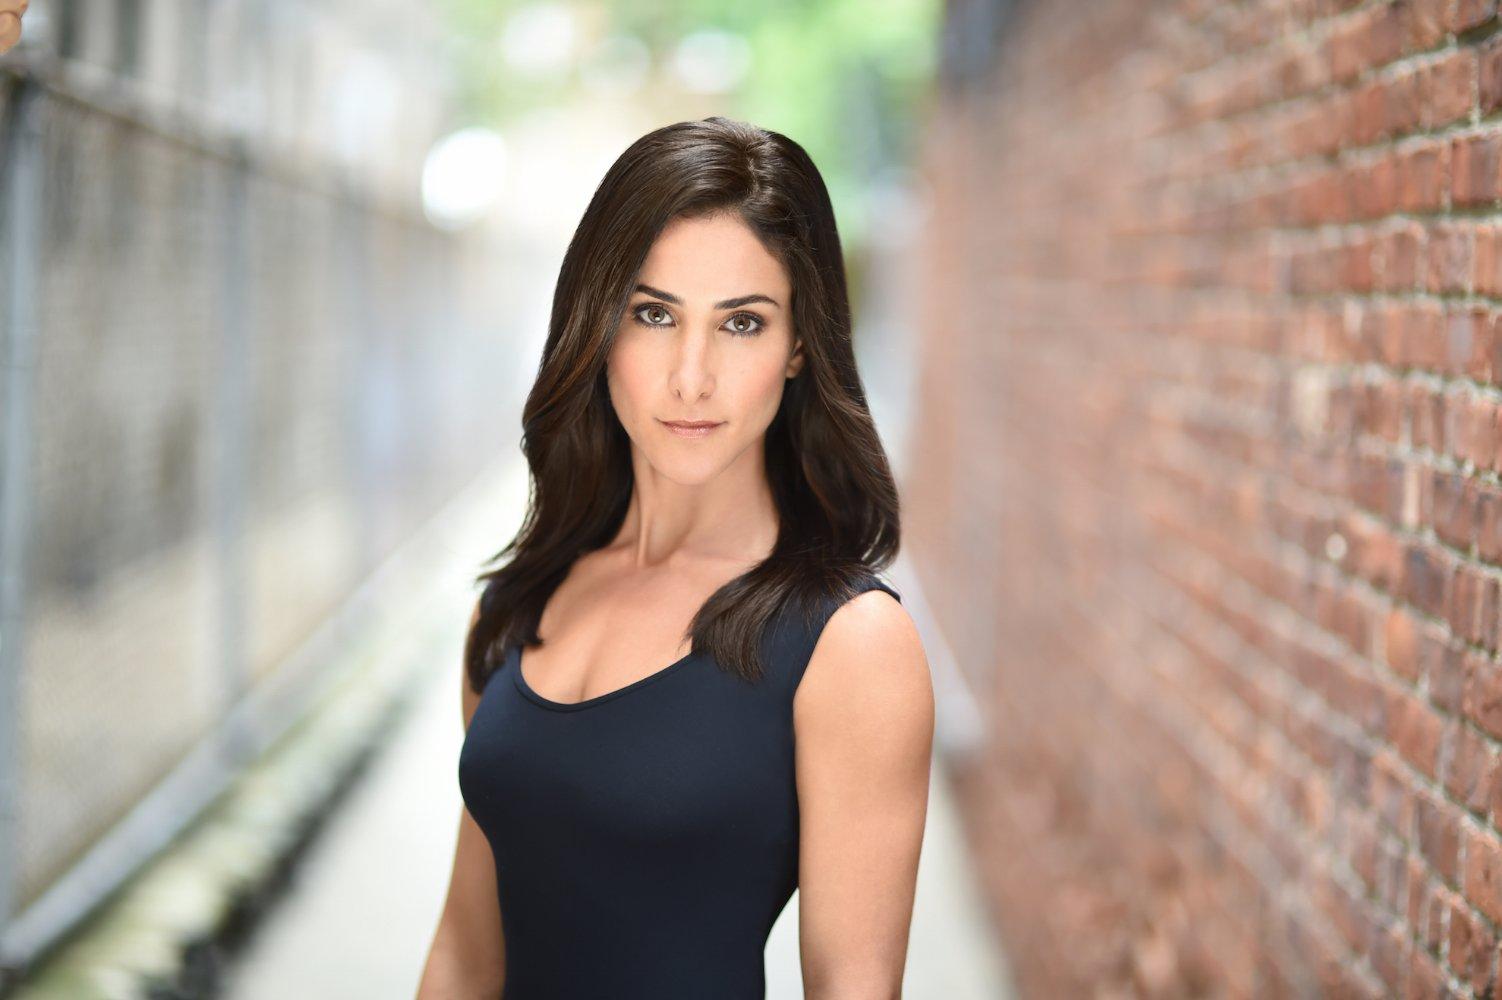 Courtney Sanello